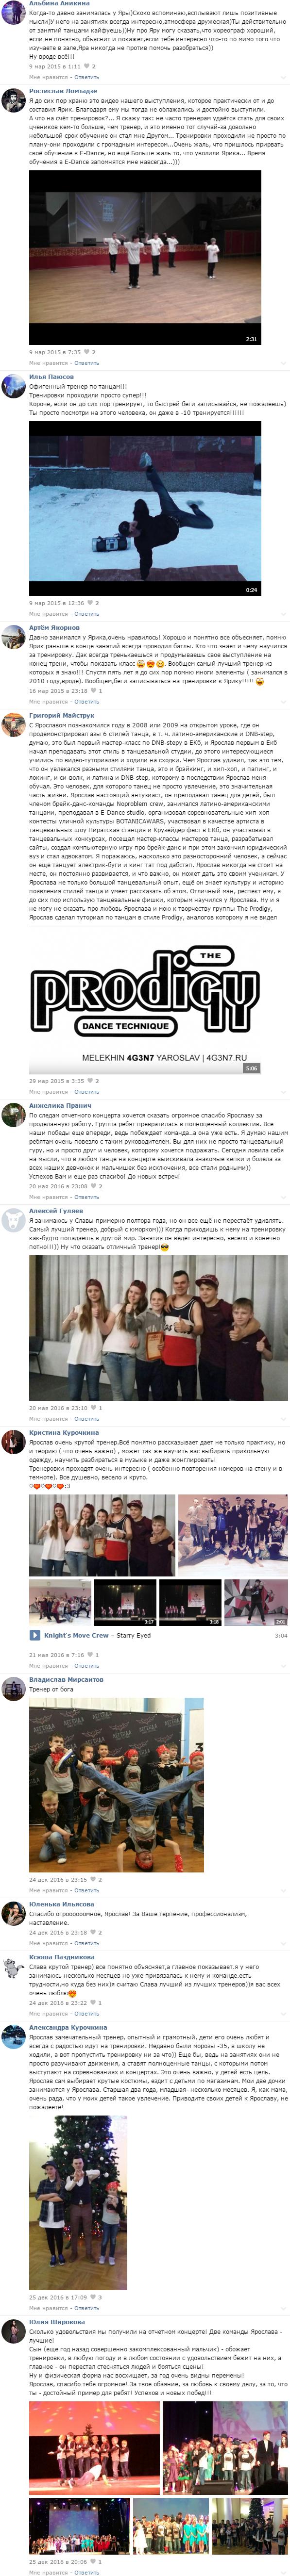 Отзывы о занятиях танцами (Ярослав Мелехин)